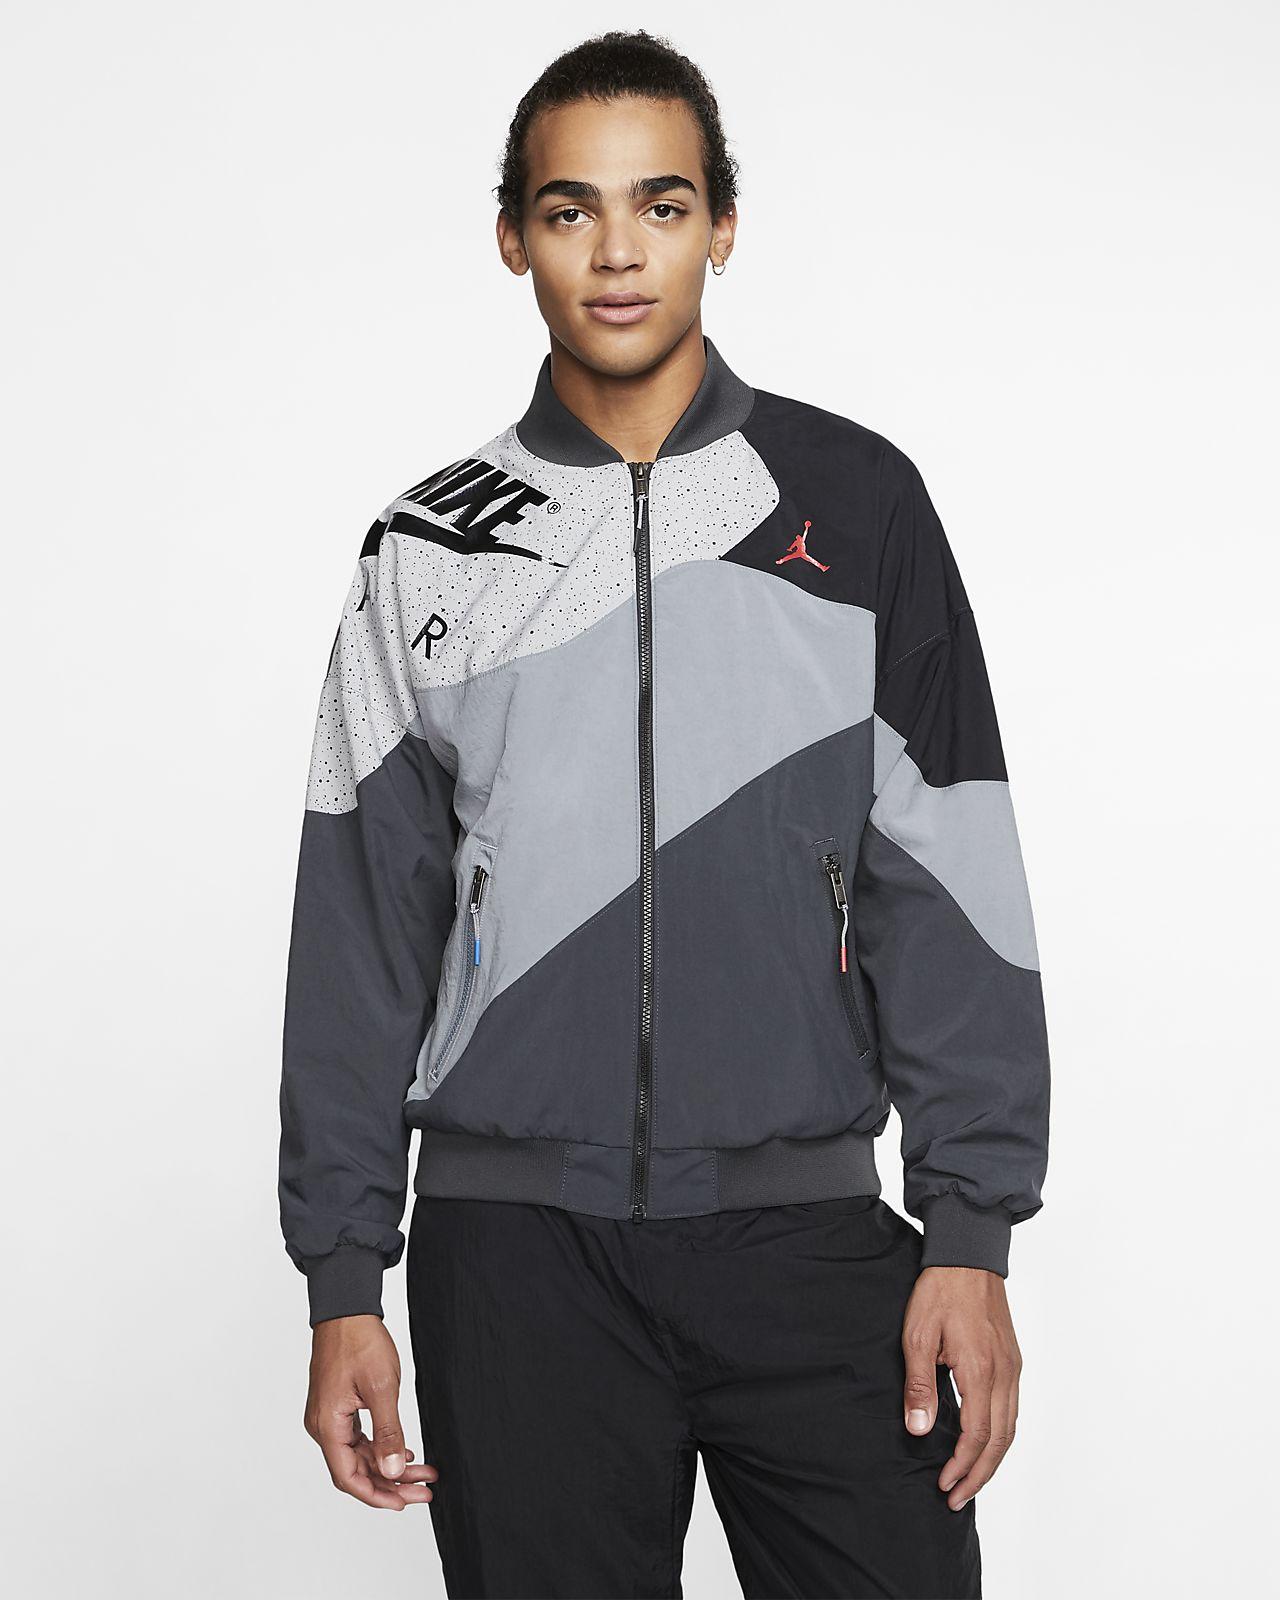 Jordan Legacy AJ4 Lightweight Jacket